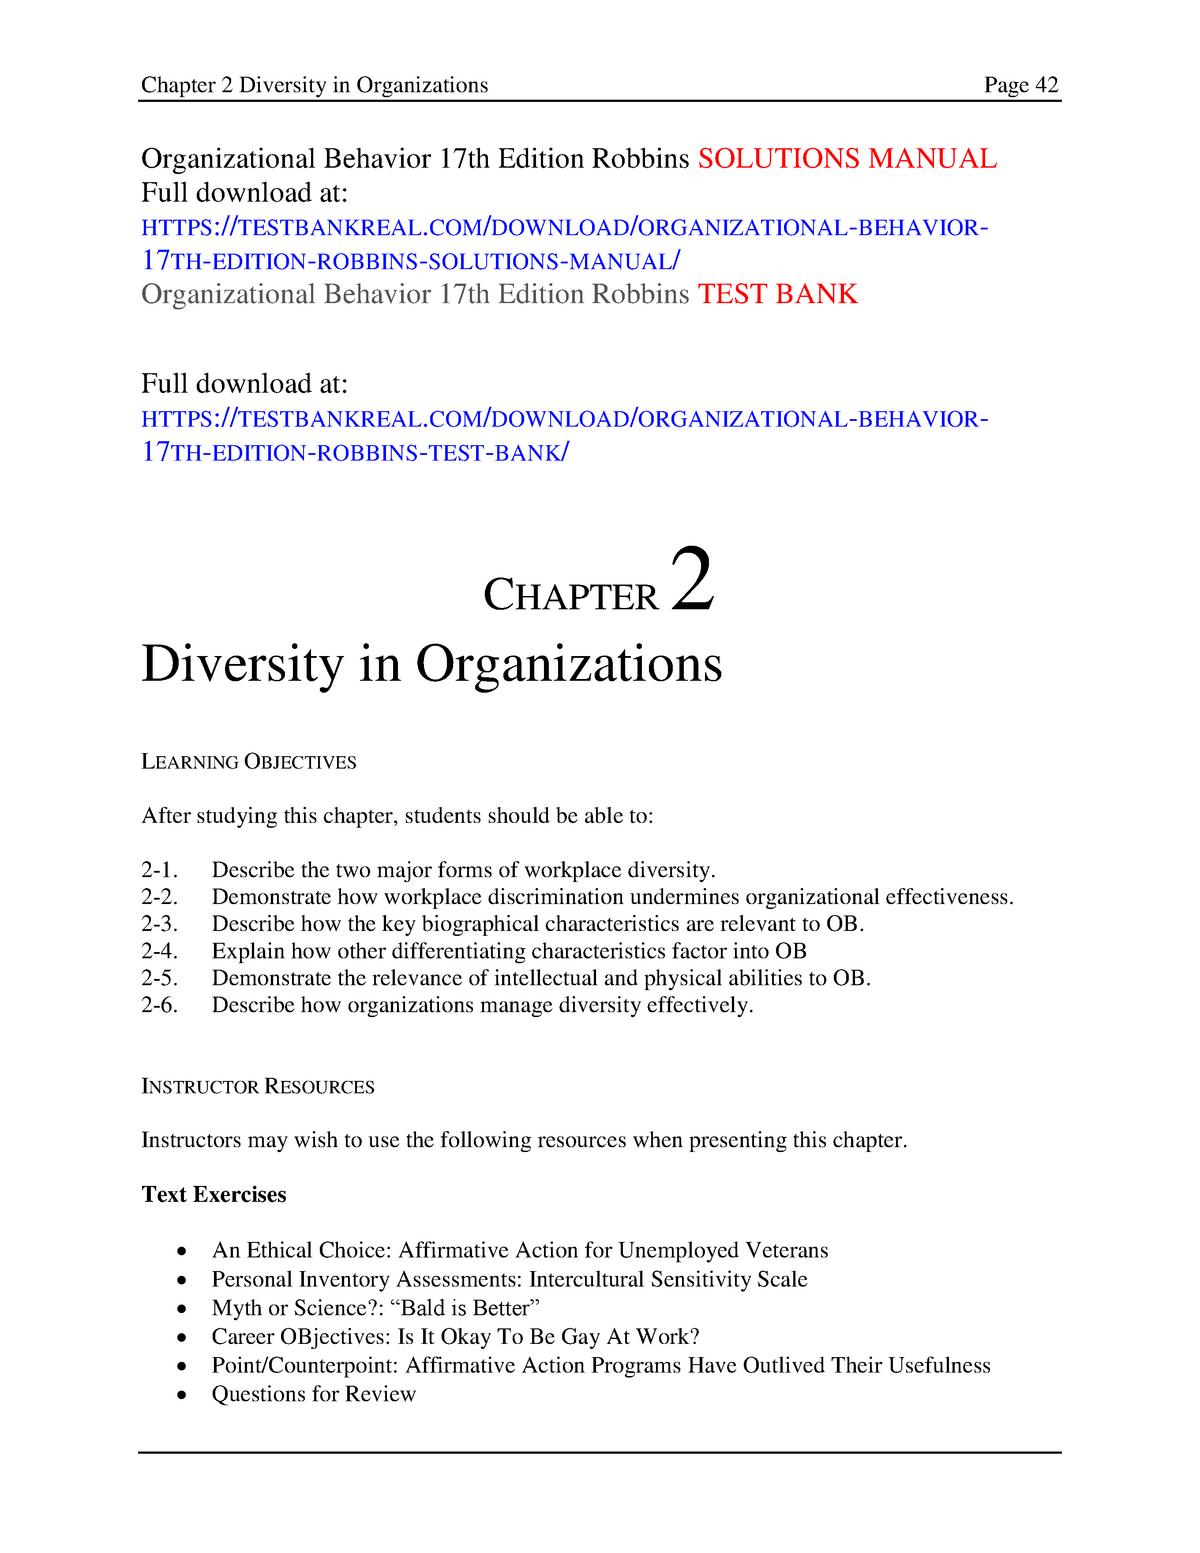 363730211 Organizational Behavior 17th Edition Robbins